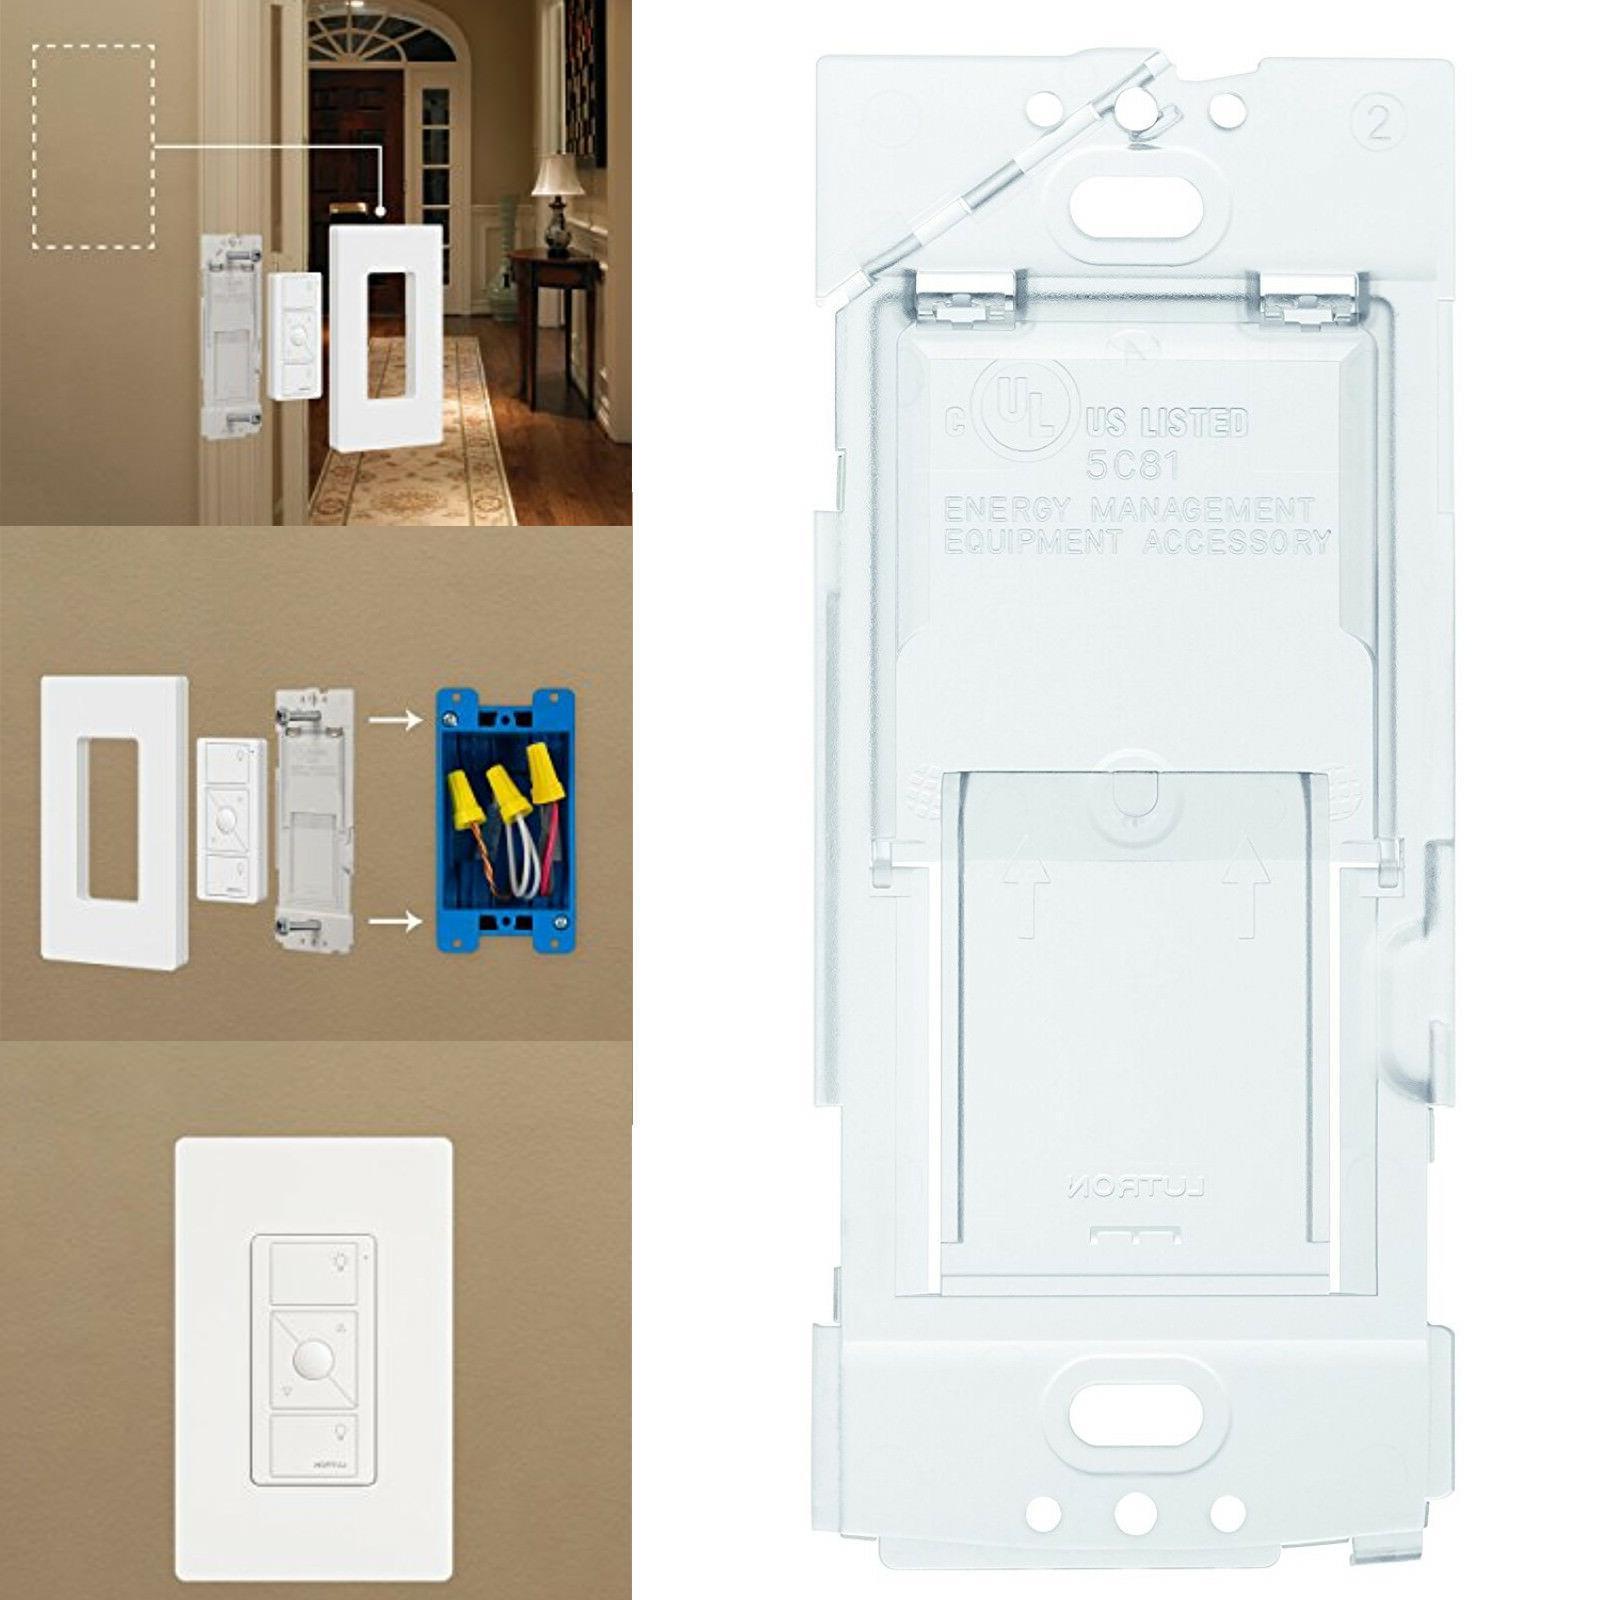 wallplate bracket lamp pico remote control dimmer